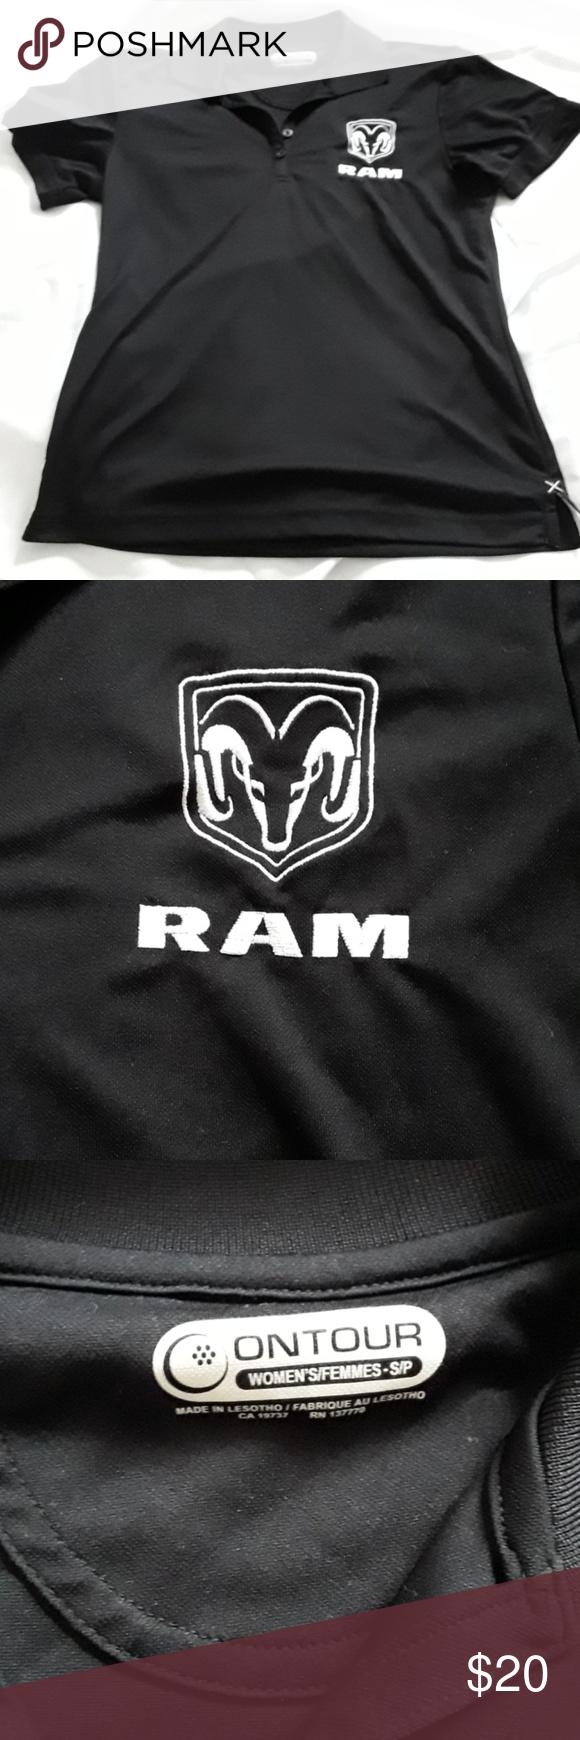 Dodge Ram Polo Tshirt In 2018 My Posh Picks Pinterest Polo T